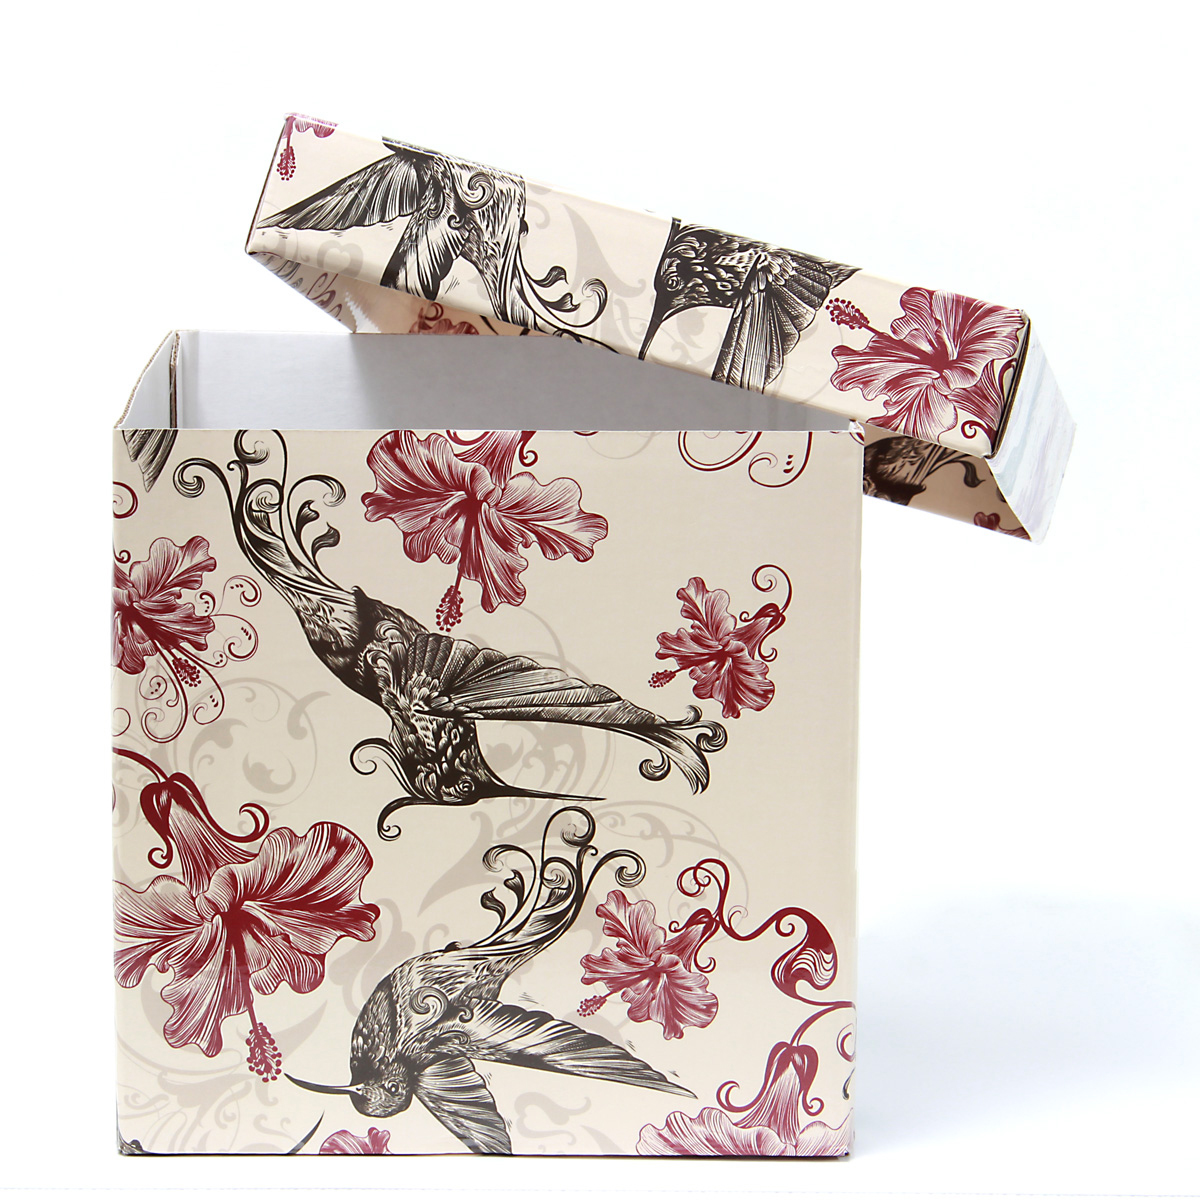 Коробка подарочная Veld-Co Giftbox. Трансформер. Нежные колибри, цвет: бежевый, 14,5 х 14,5 х 14,5 см коробка подарочная veld co giftbox трансформер нежные цветы цвет белый 10 3 х 10 3 х 9 8 см